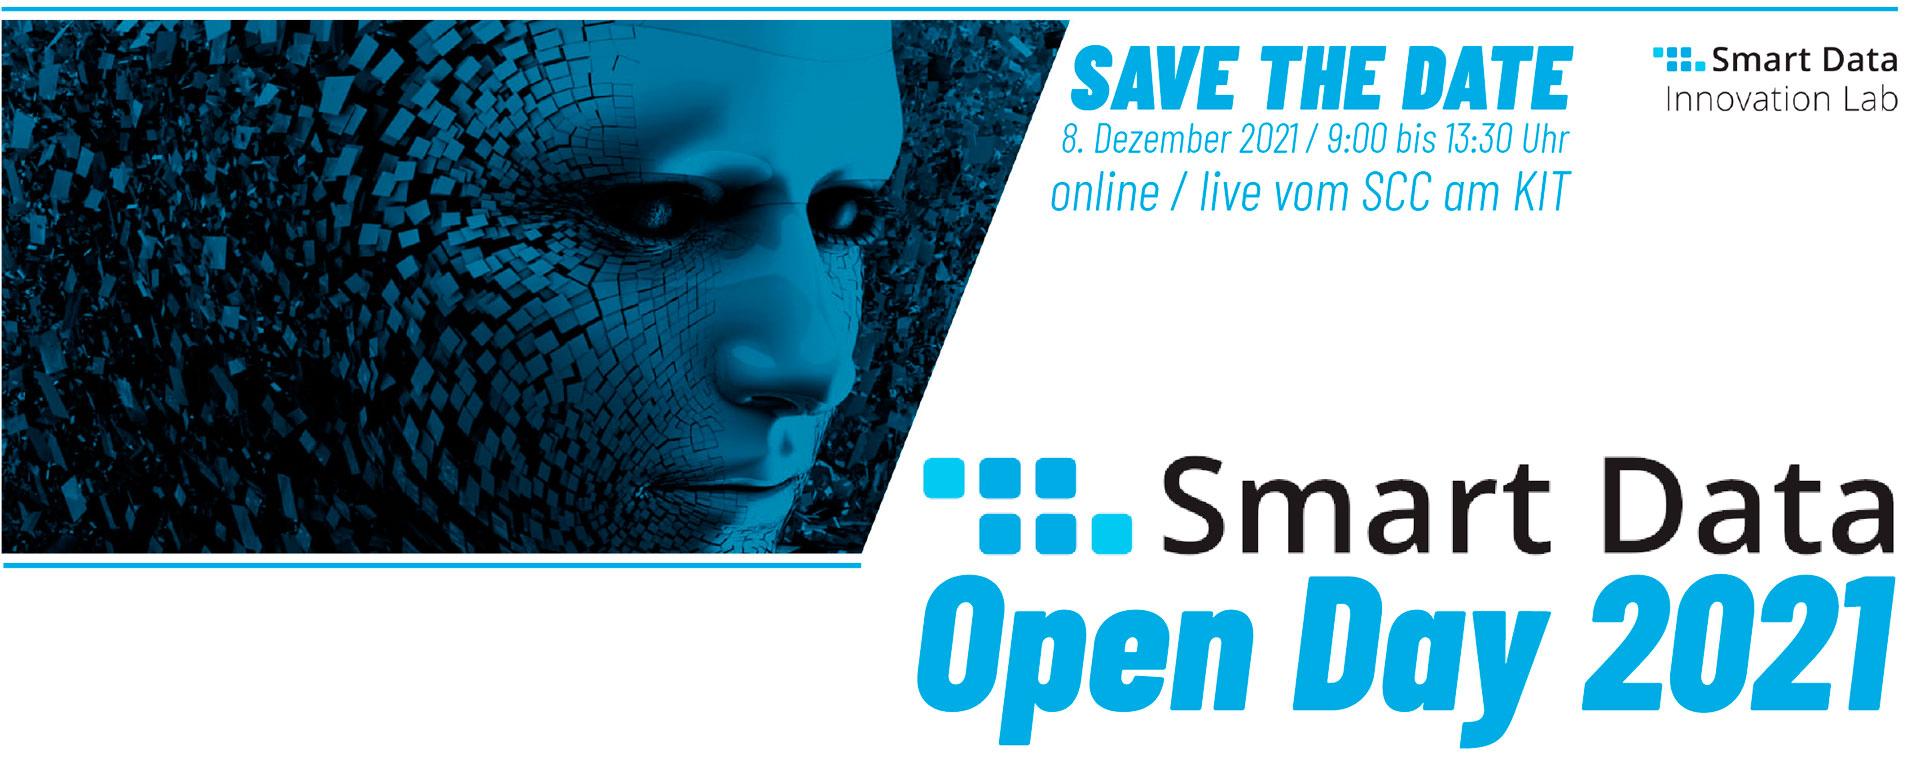 Smart Data Open Day 2021